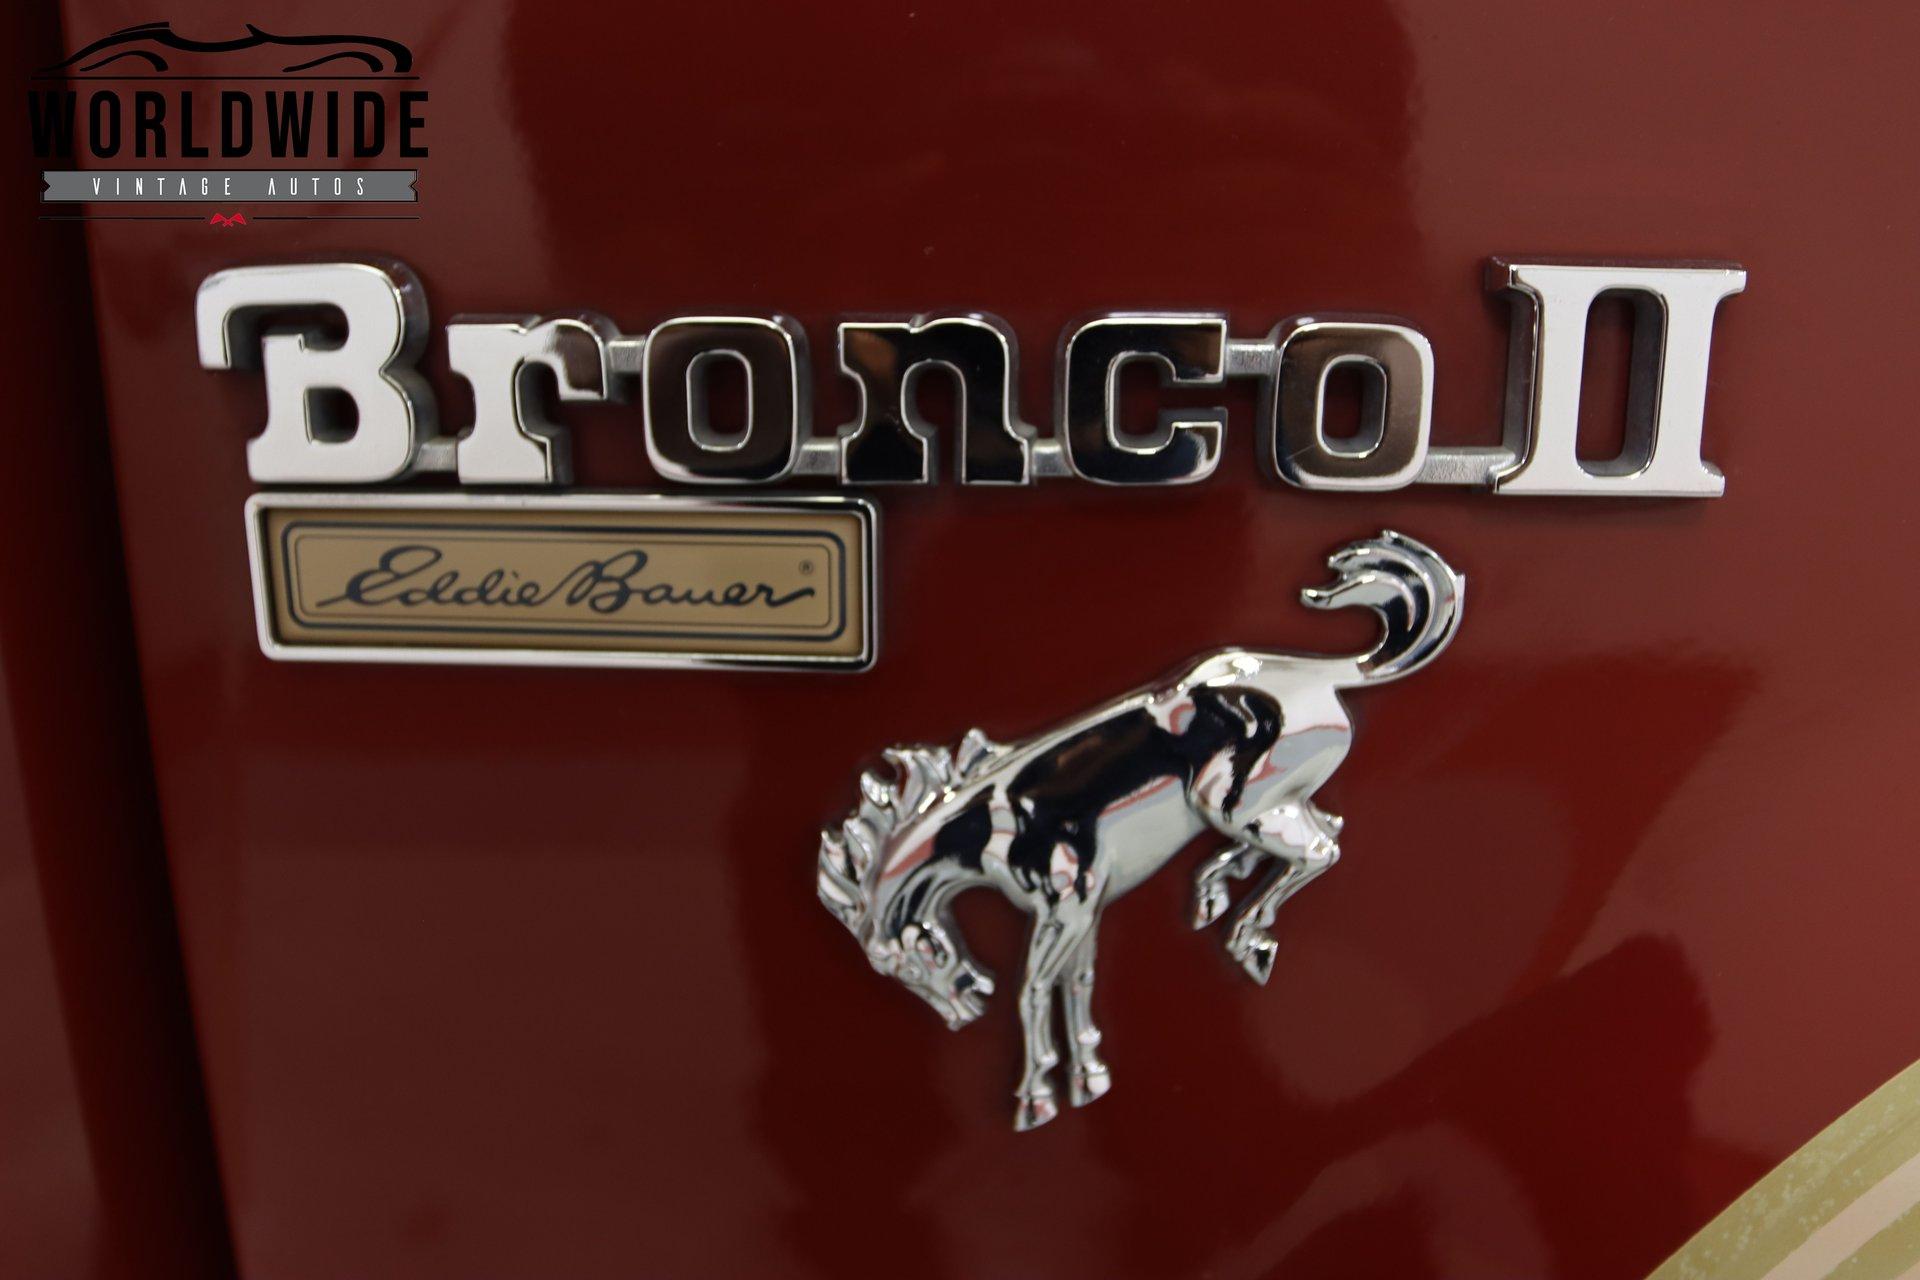 1986 Ford BRONCO II